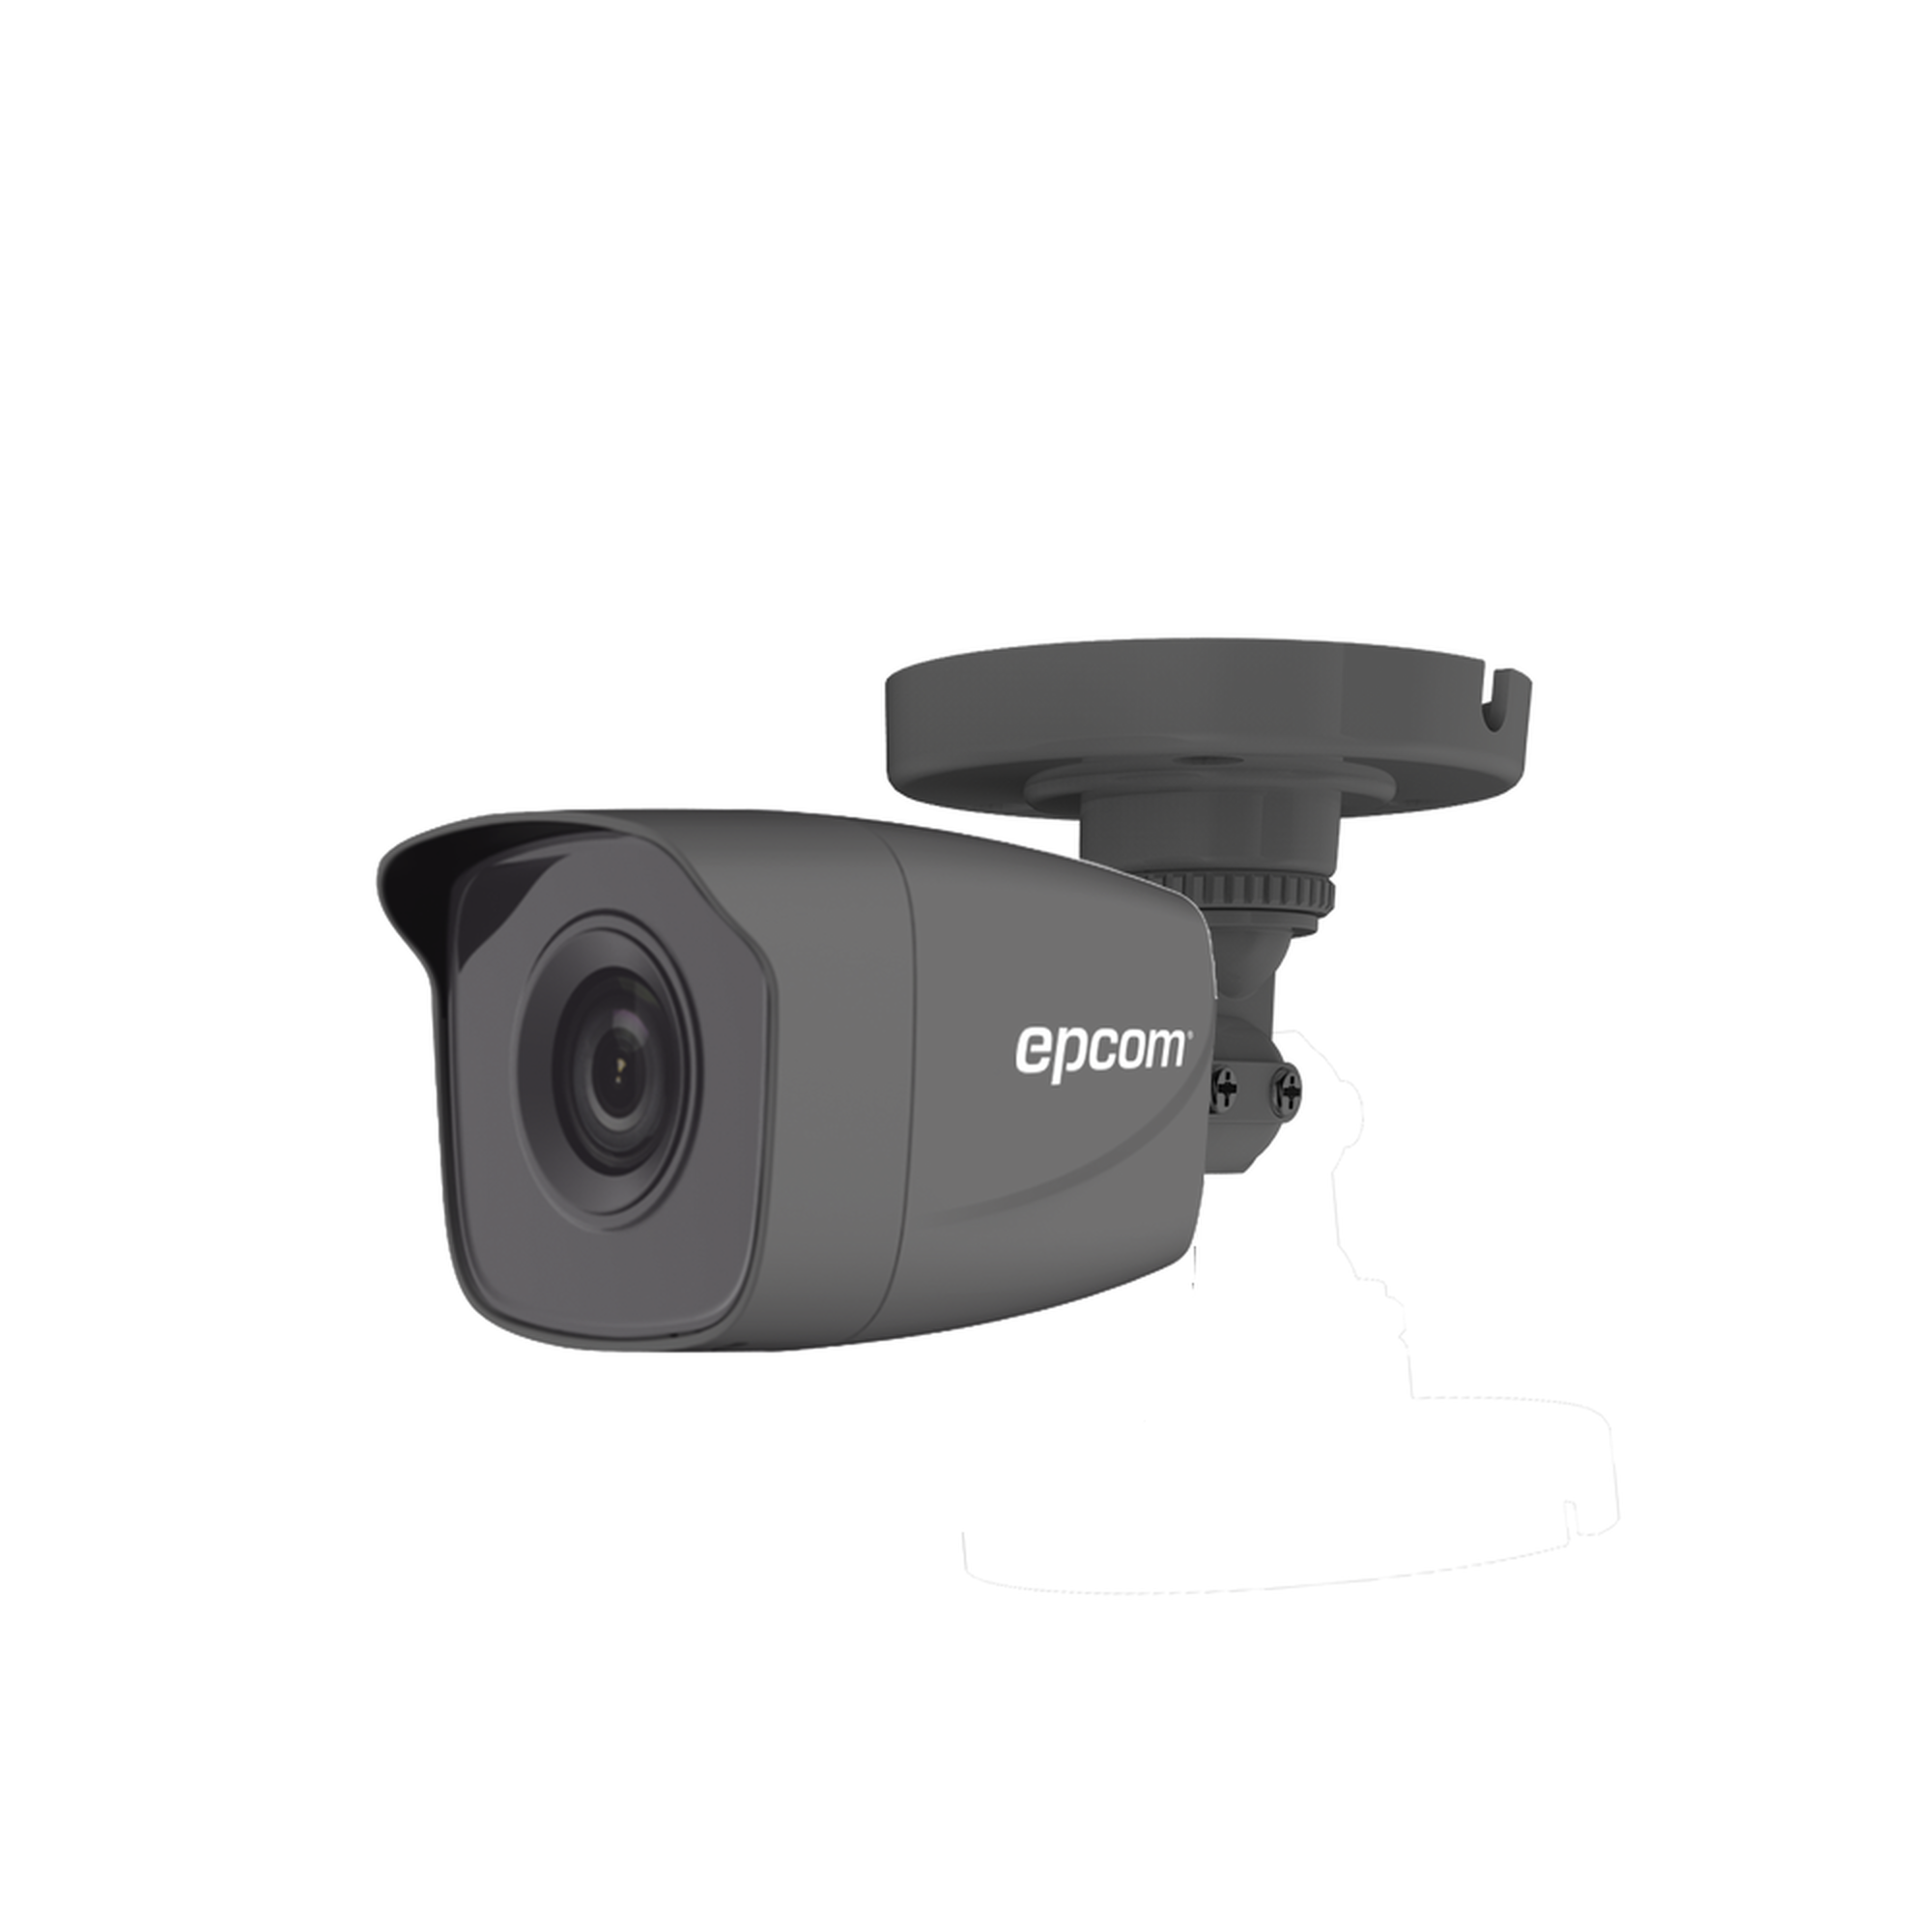 Bala TURBOHD 720p / METáLICA / Gran Angular 92? / Lente 2.8 mm / IR EXIR Inteligente 20 mts / Exterior IP66 / 4 Tecnologías (TVI / AHD / CVI / CVBS)